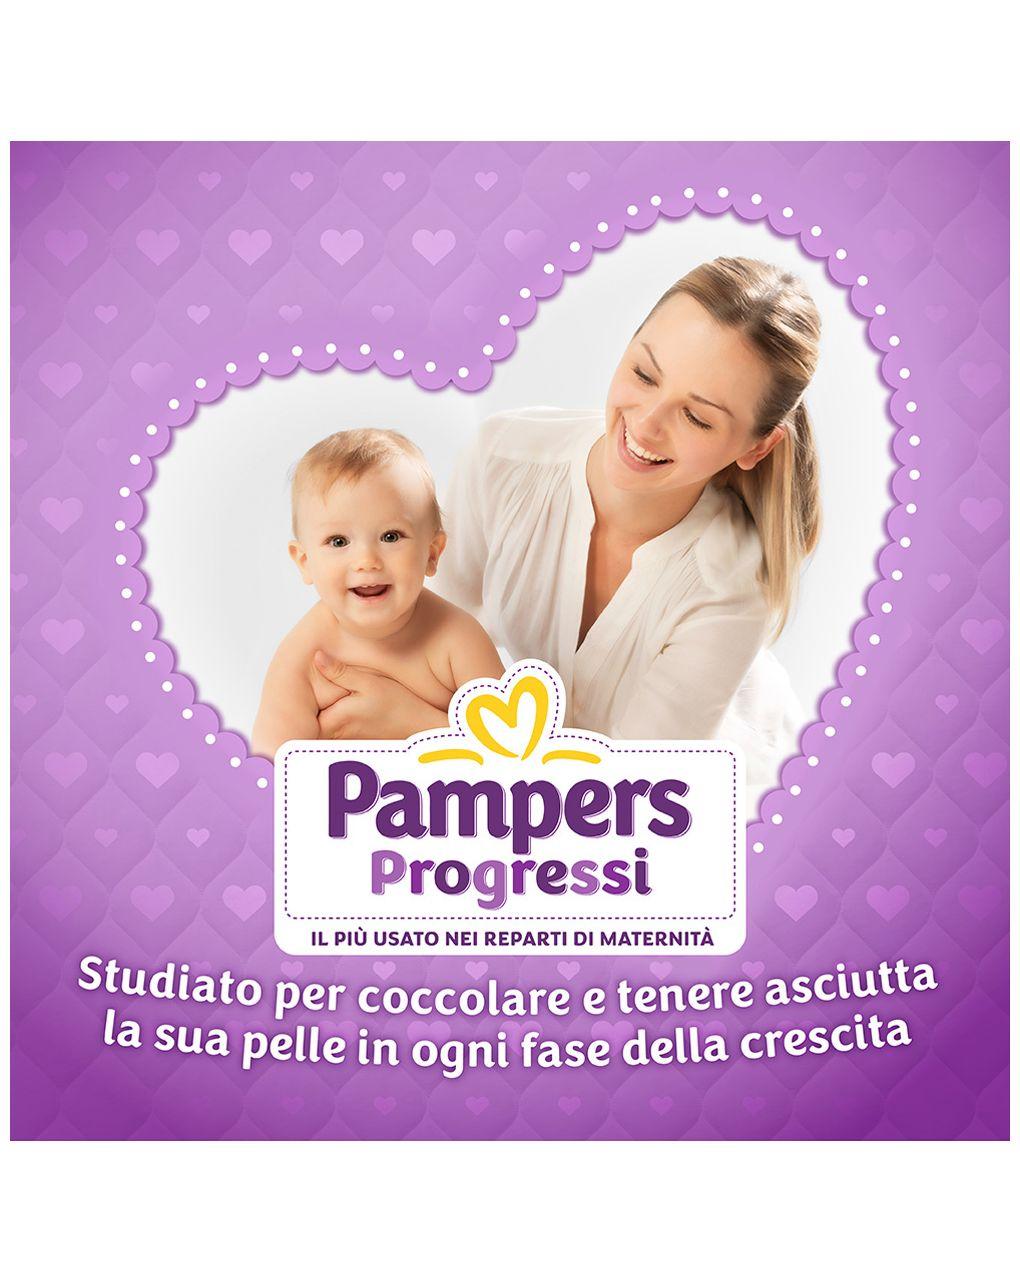 Pampers - pannolini progressi esapack tg. 4 (132 pz) - Pampers